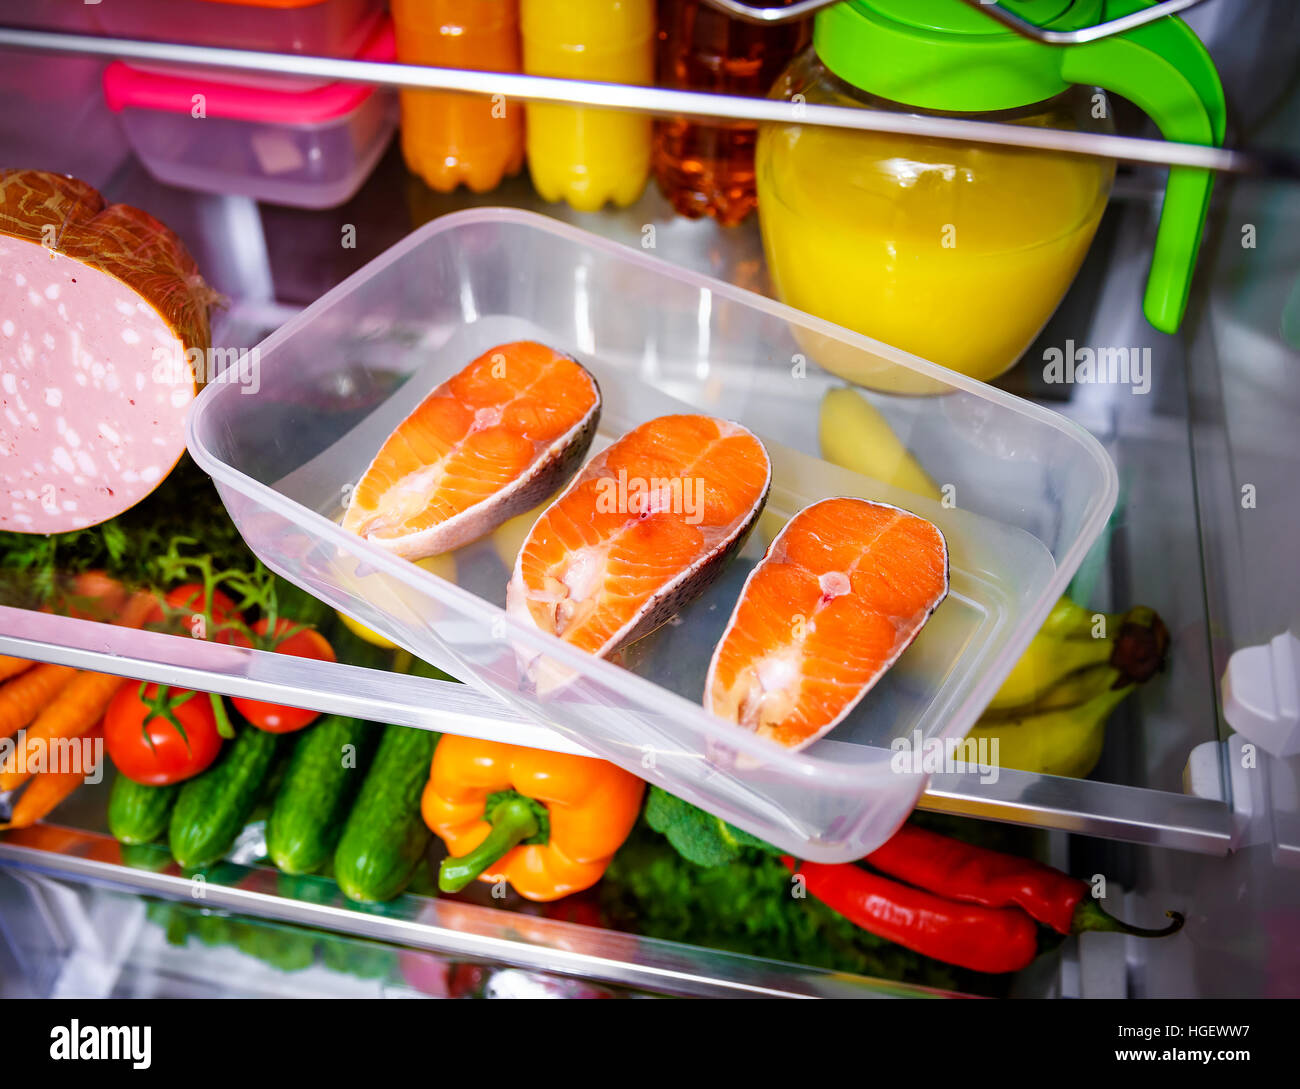 Raw Salmon steak in the open refrigerator - Stock Image